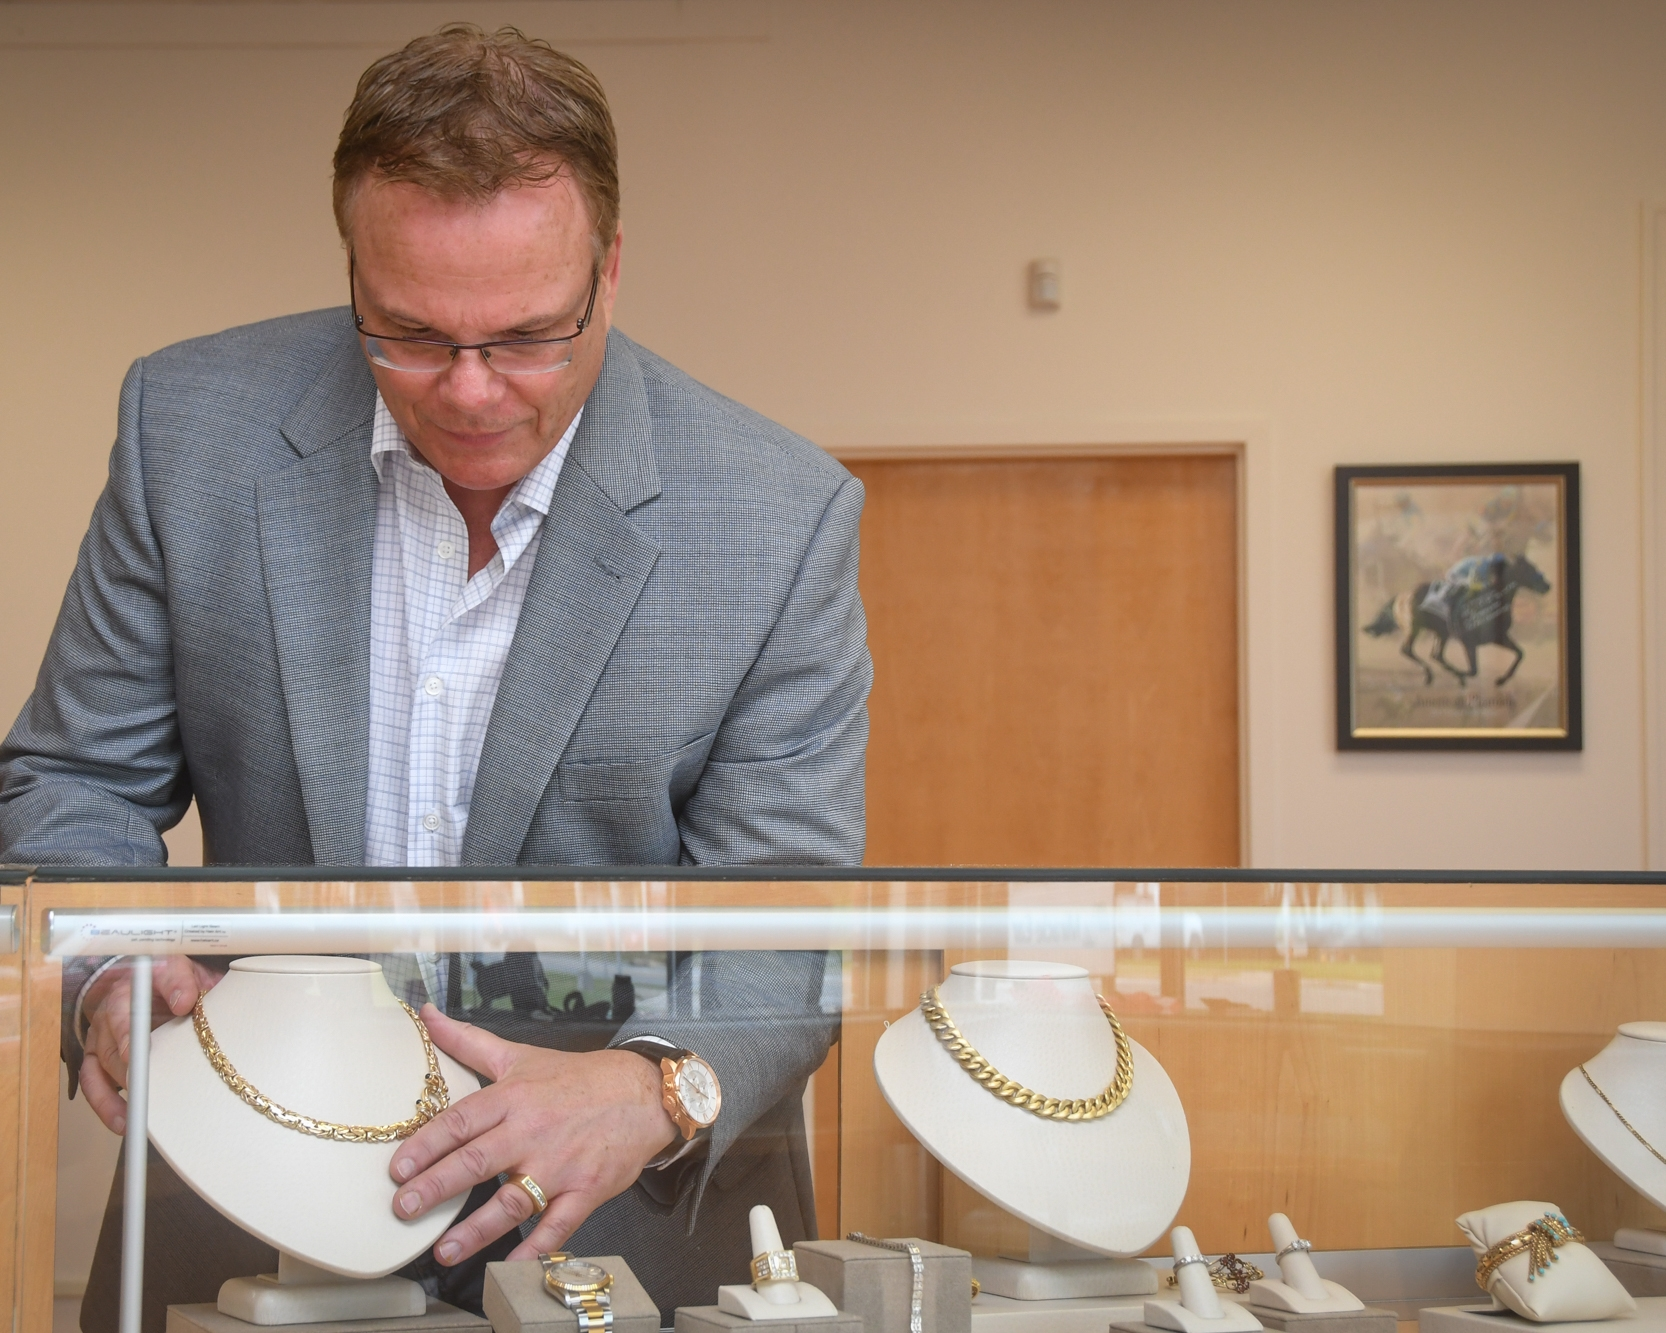 Brian Bucher, Jewelry Manager